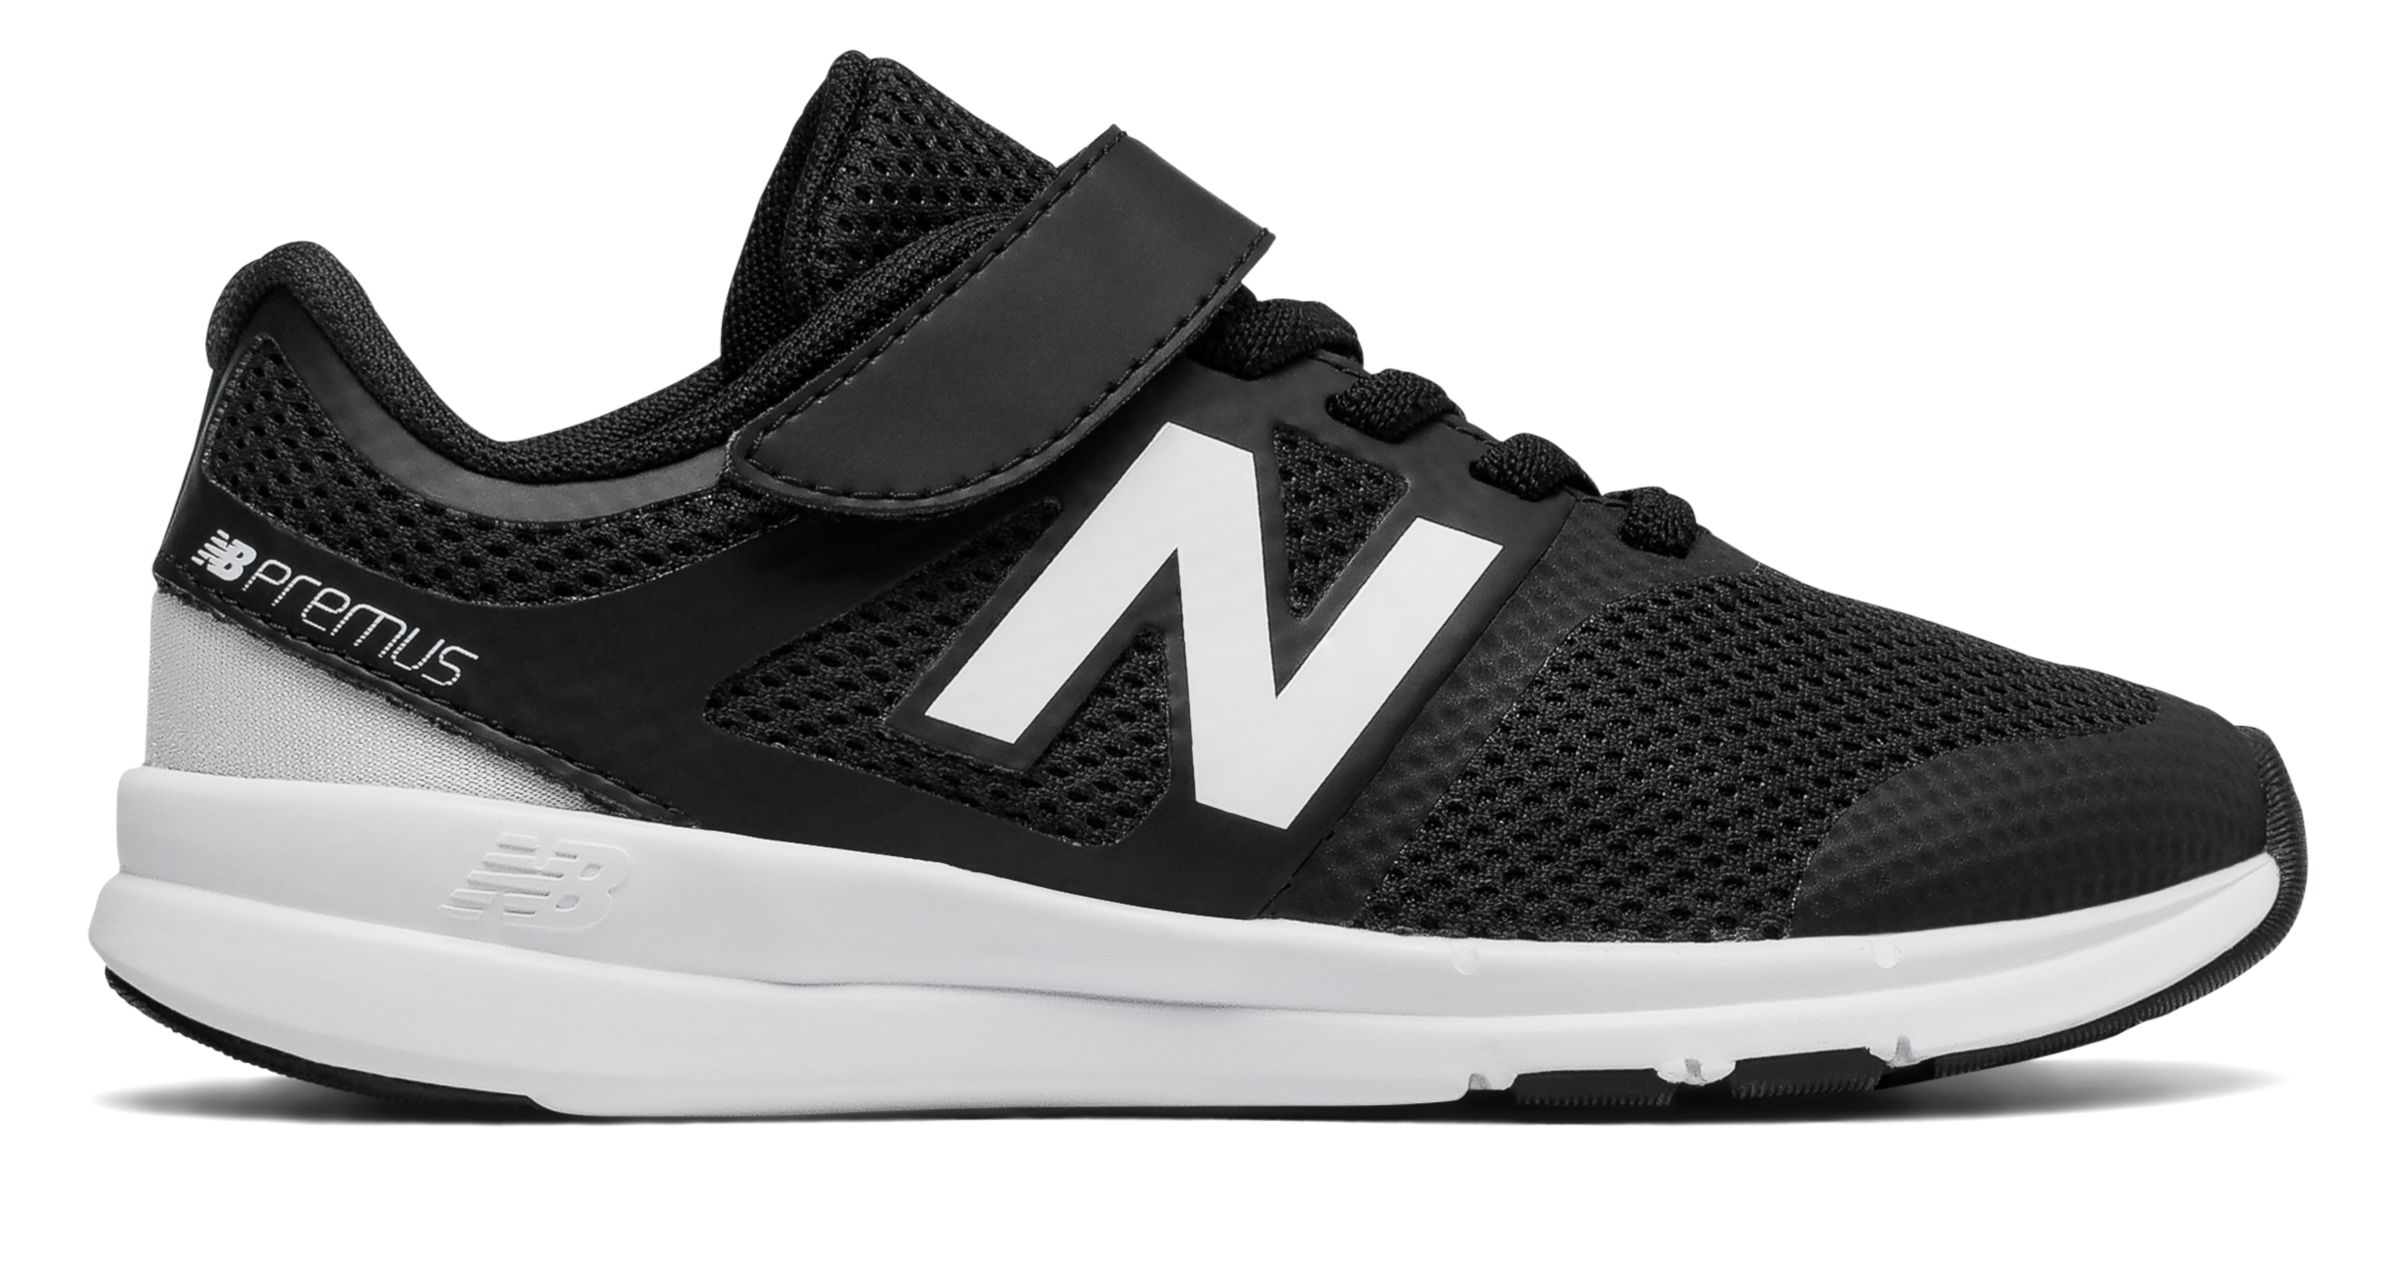 NB Premus Trainer, Black with White